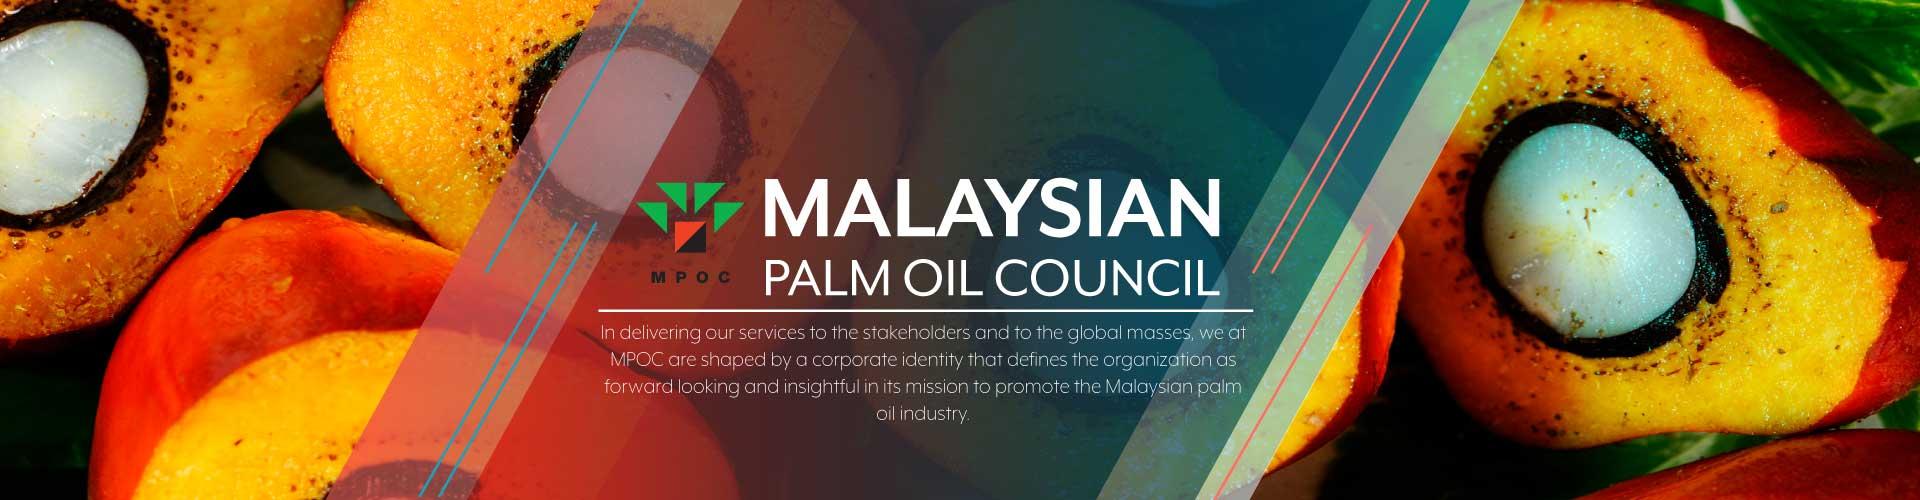 MPOC – Malaysian Palm Oil Council